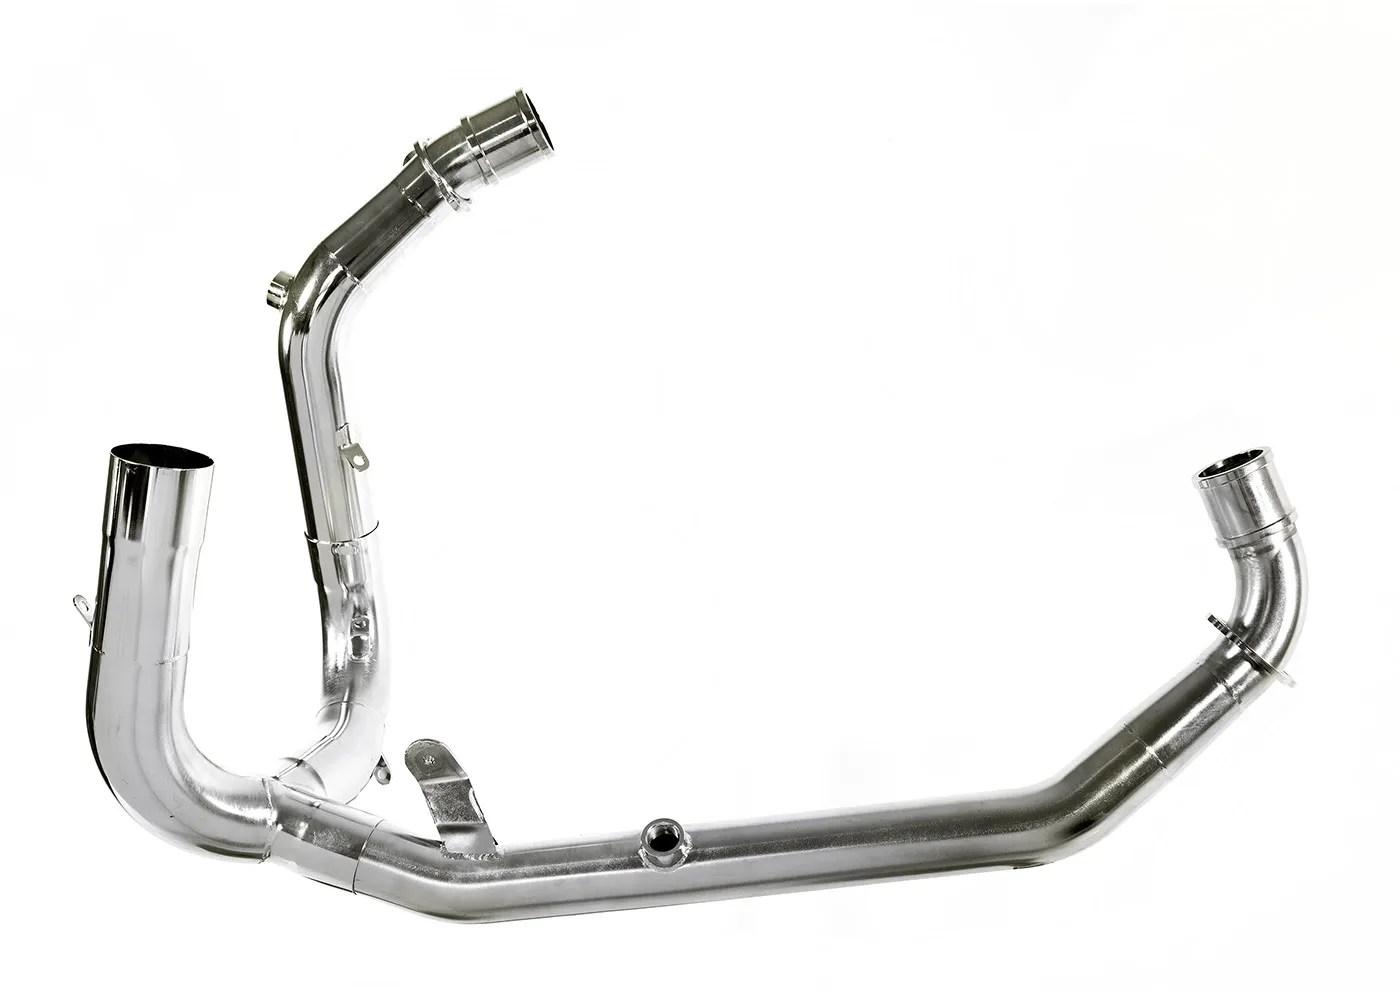 Ducati HYPERMOTARD 796 (09-12) COLLECTOR to remove the